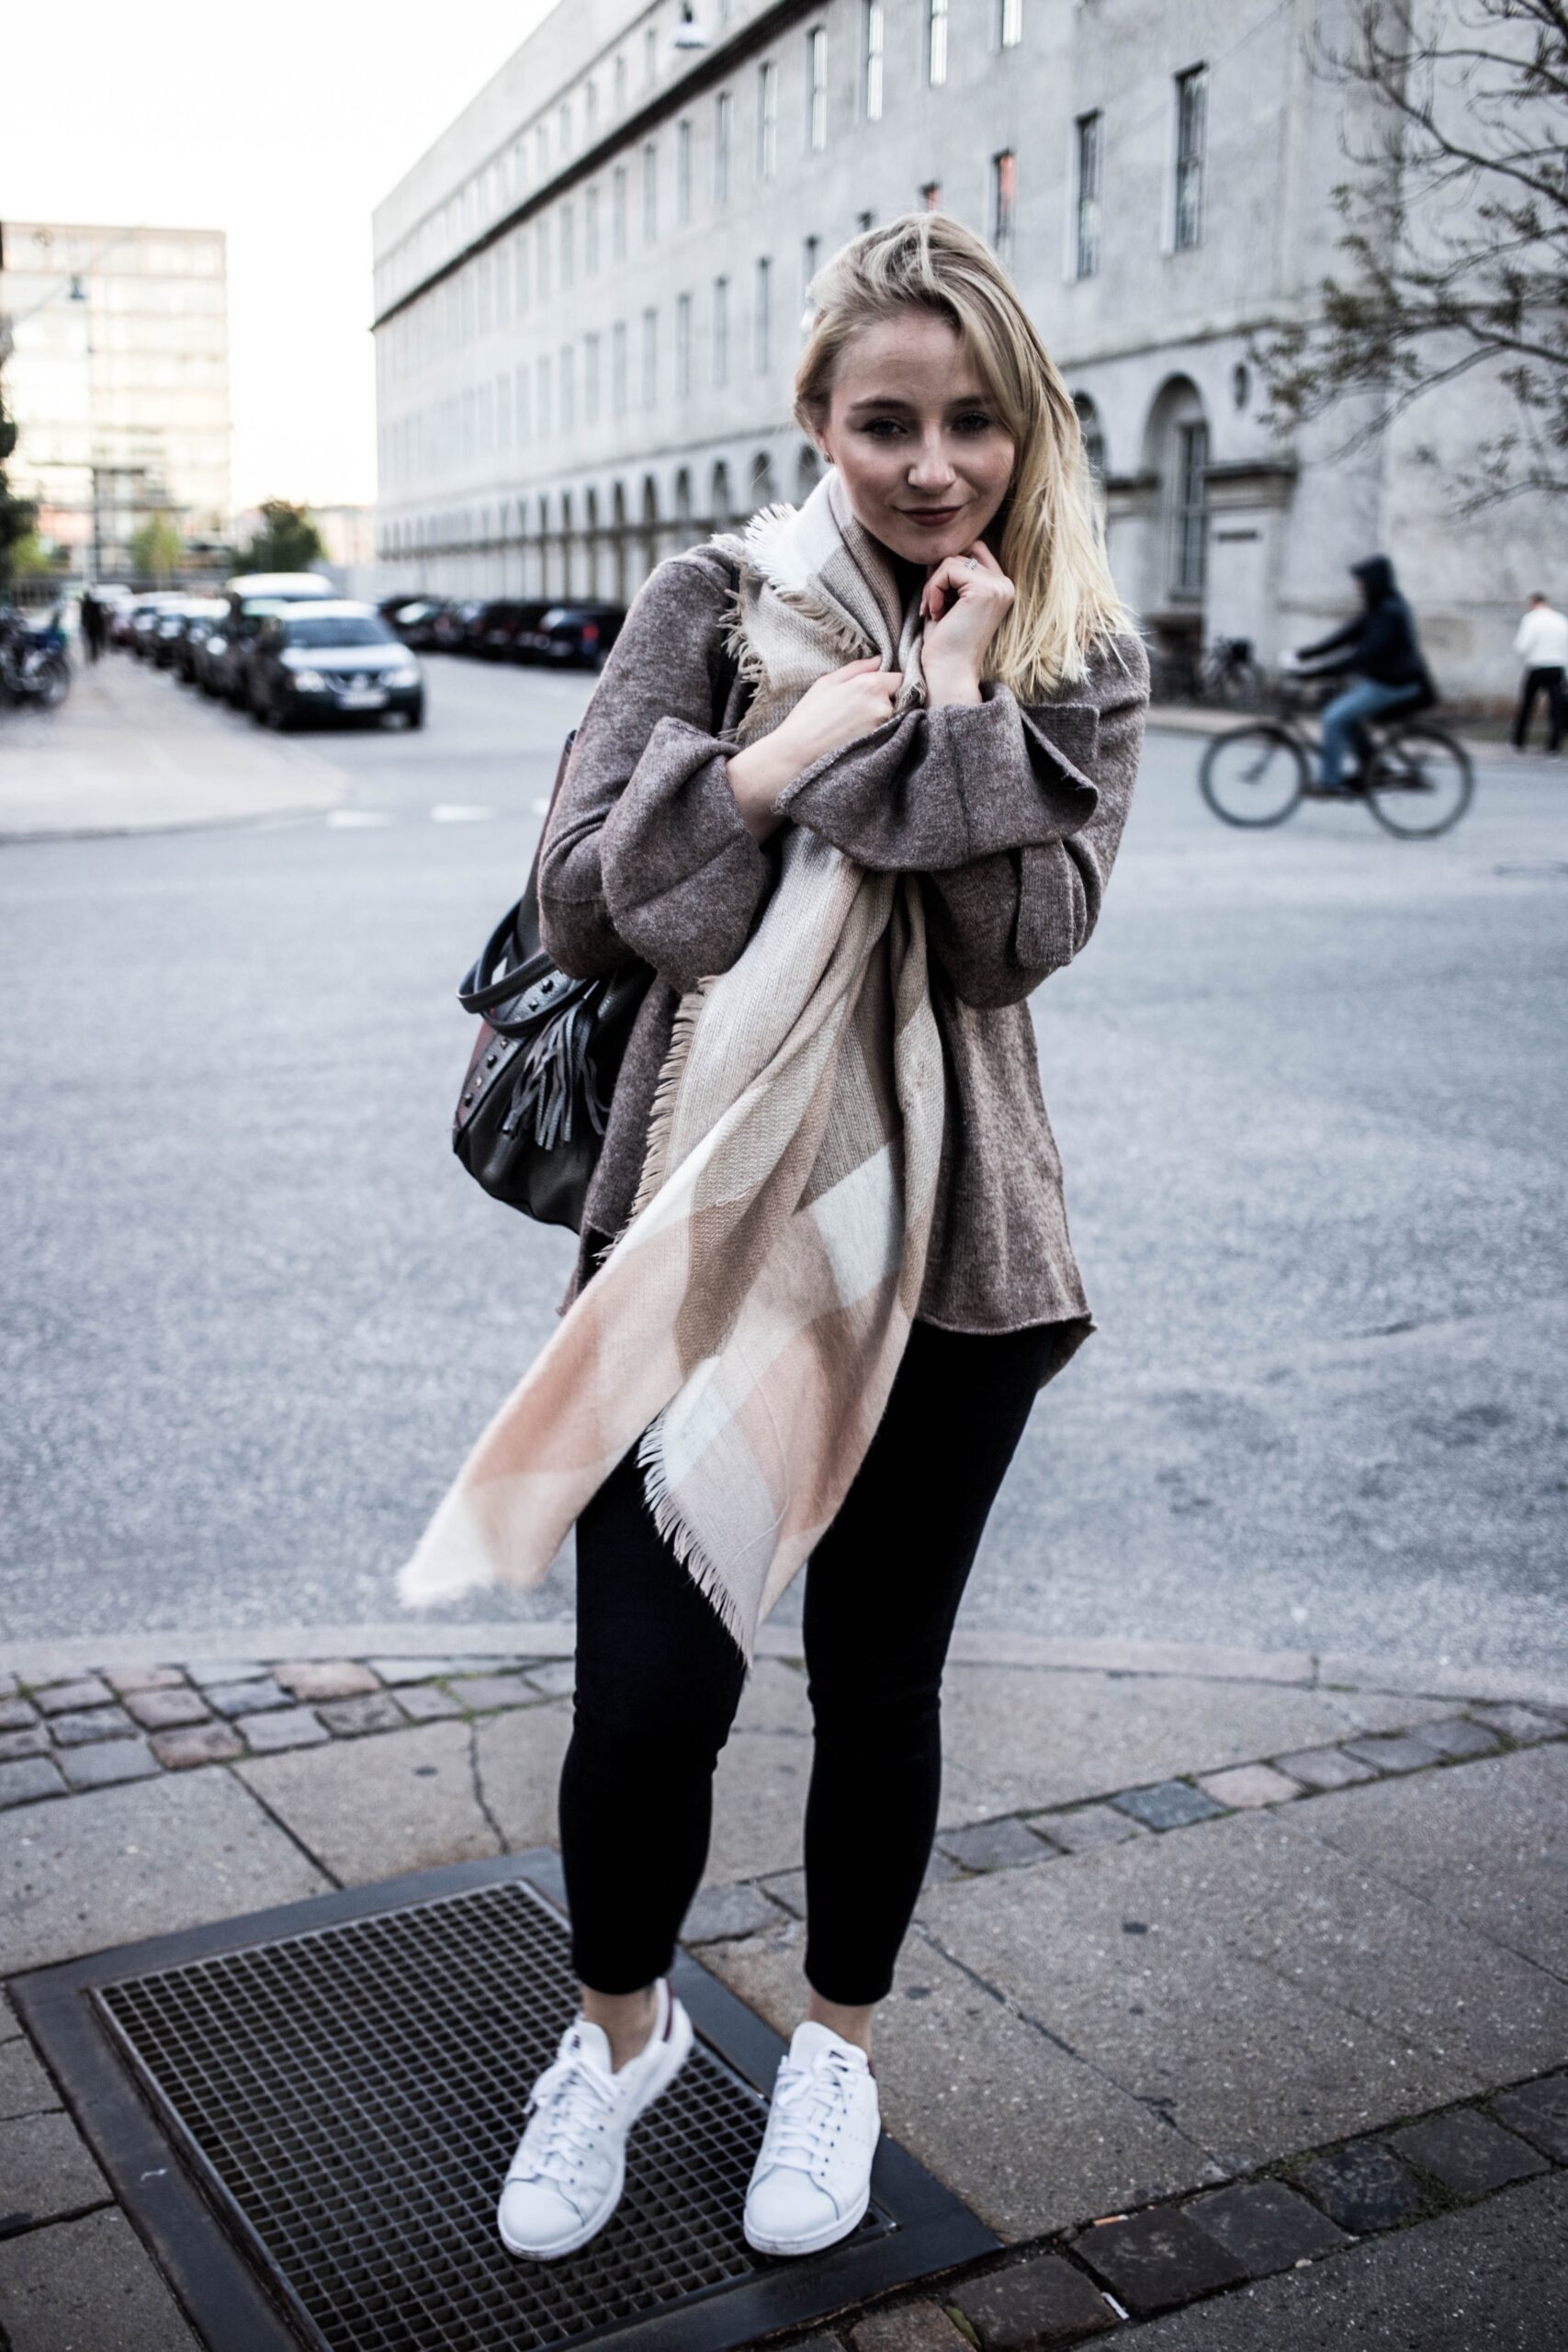 herbst-outfit-kopenhagen-basic-look-travelblog-fashionblog_5498-1